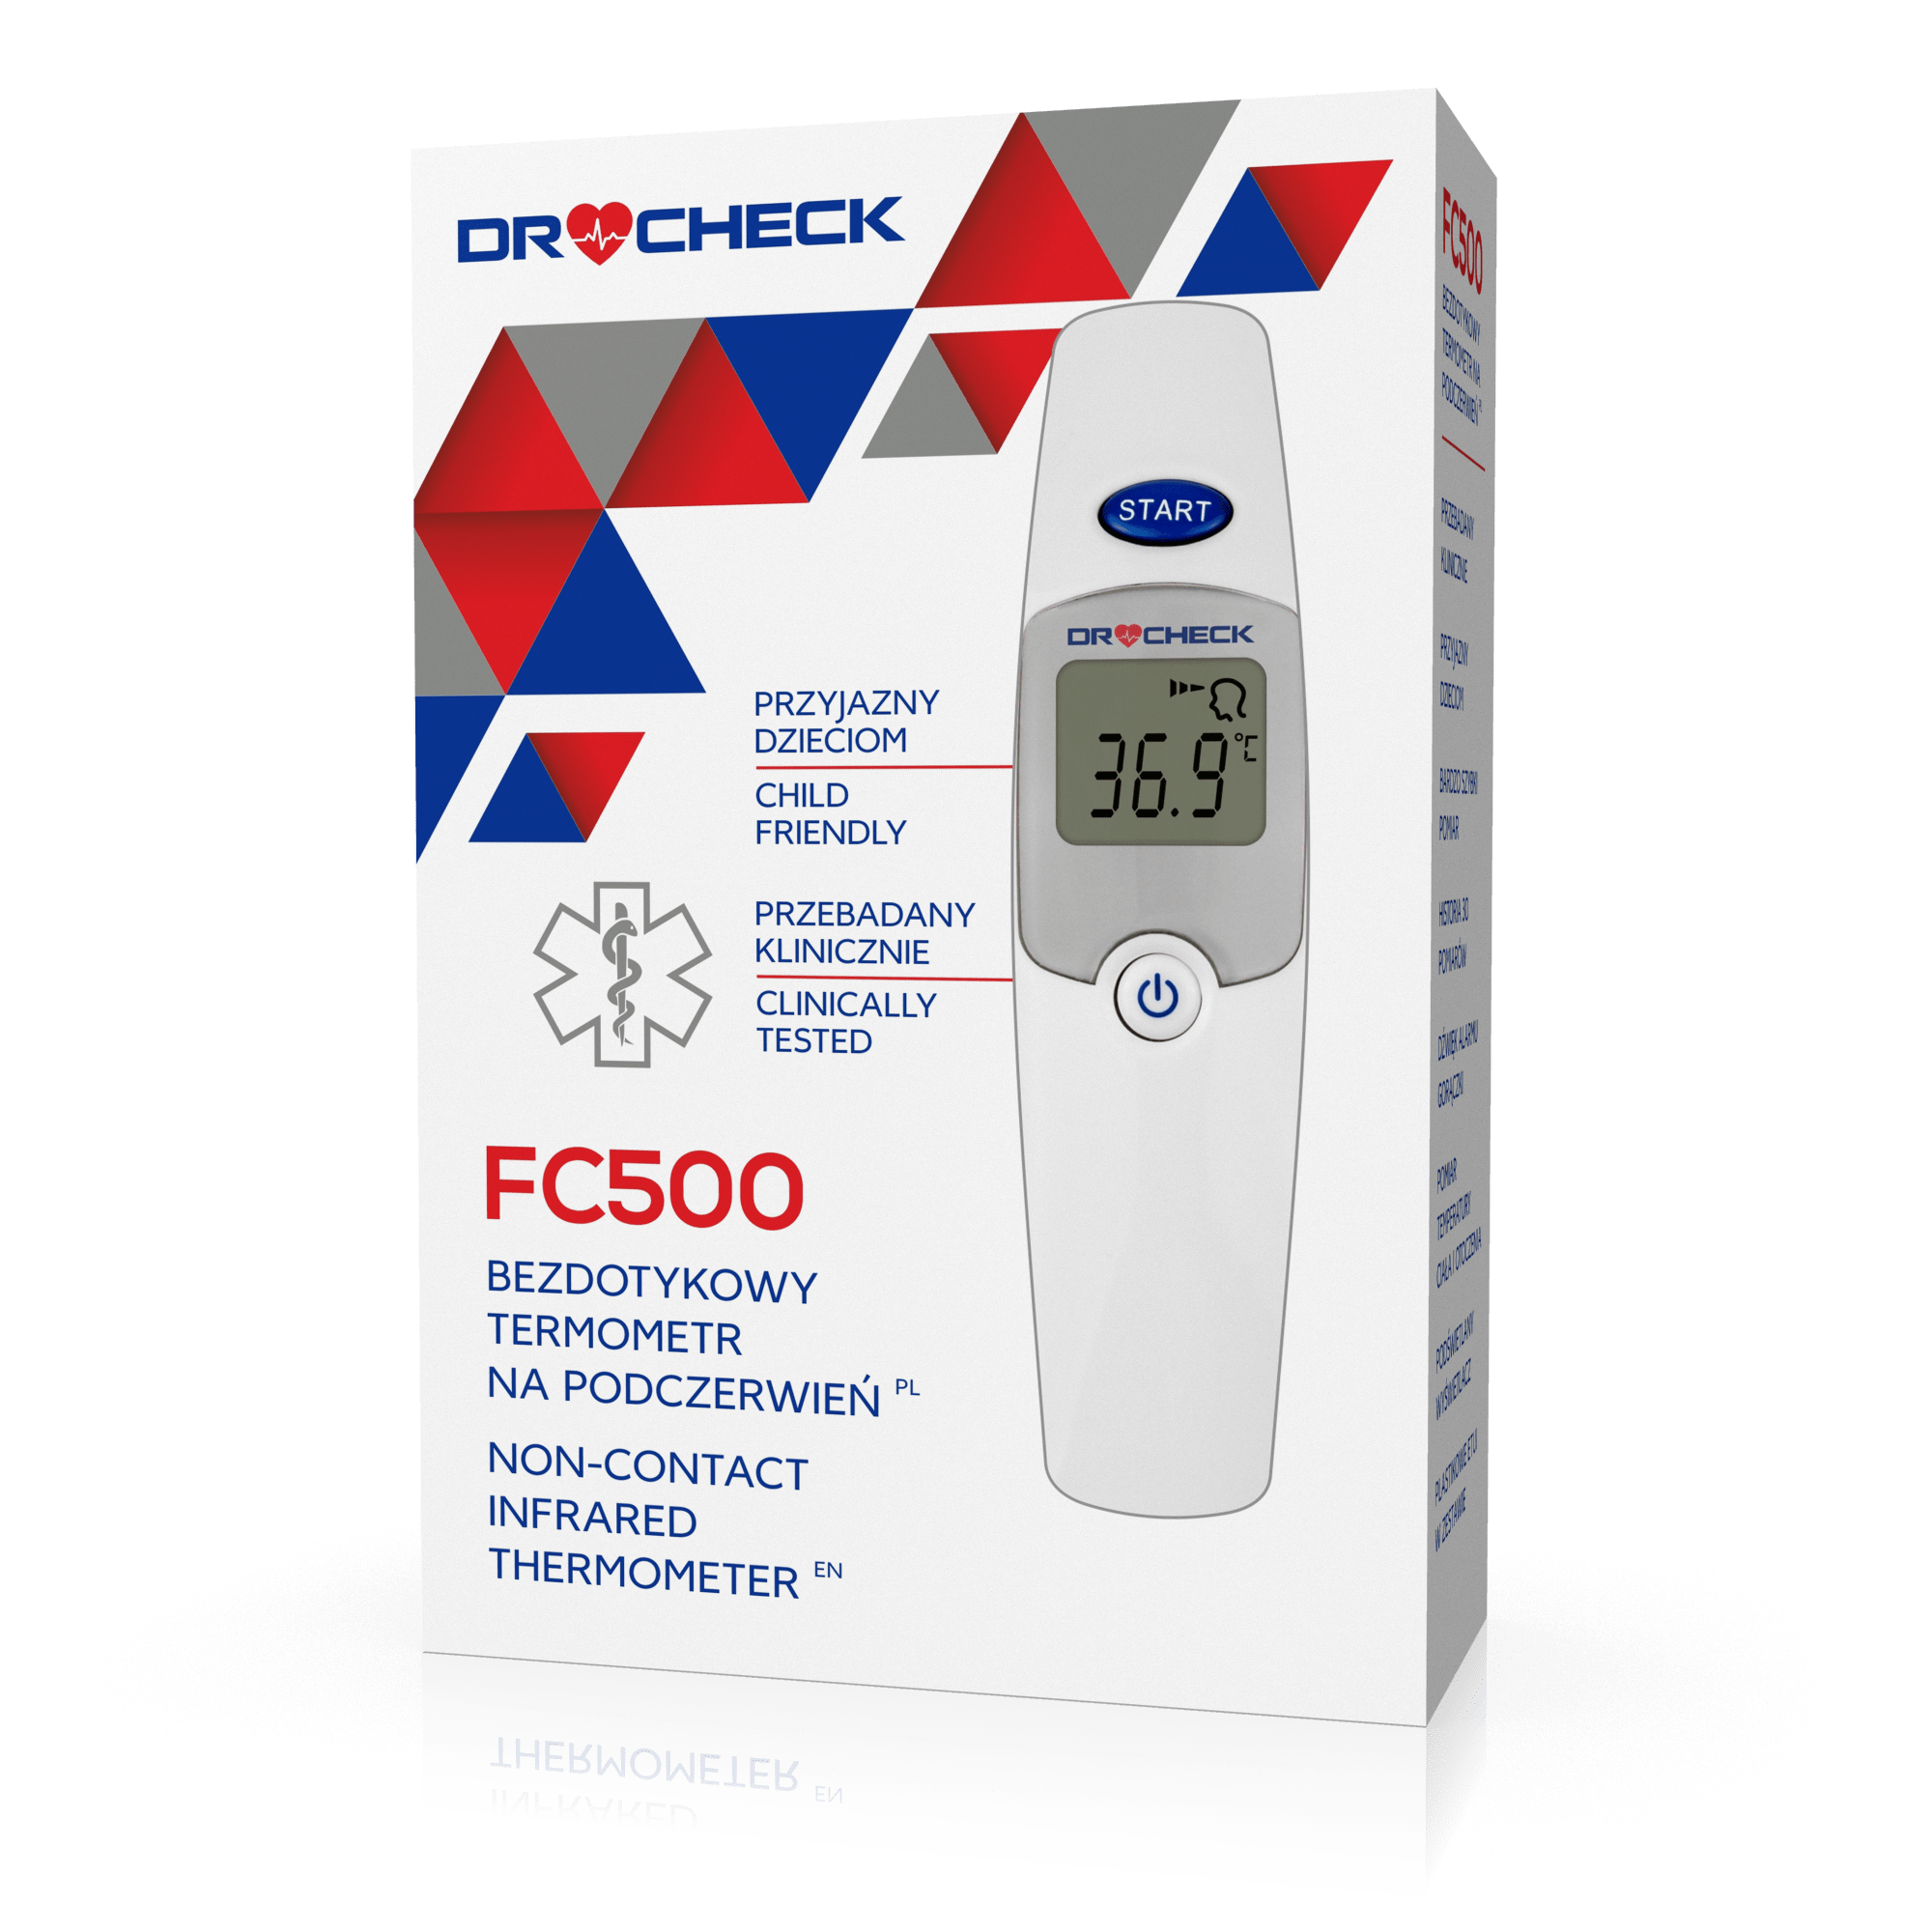 Termometr DR CHECK FC 500